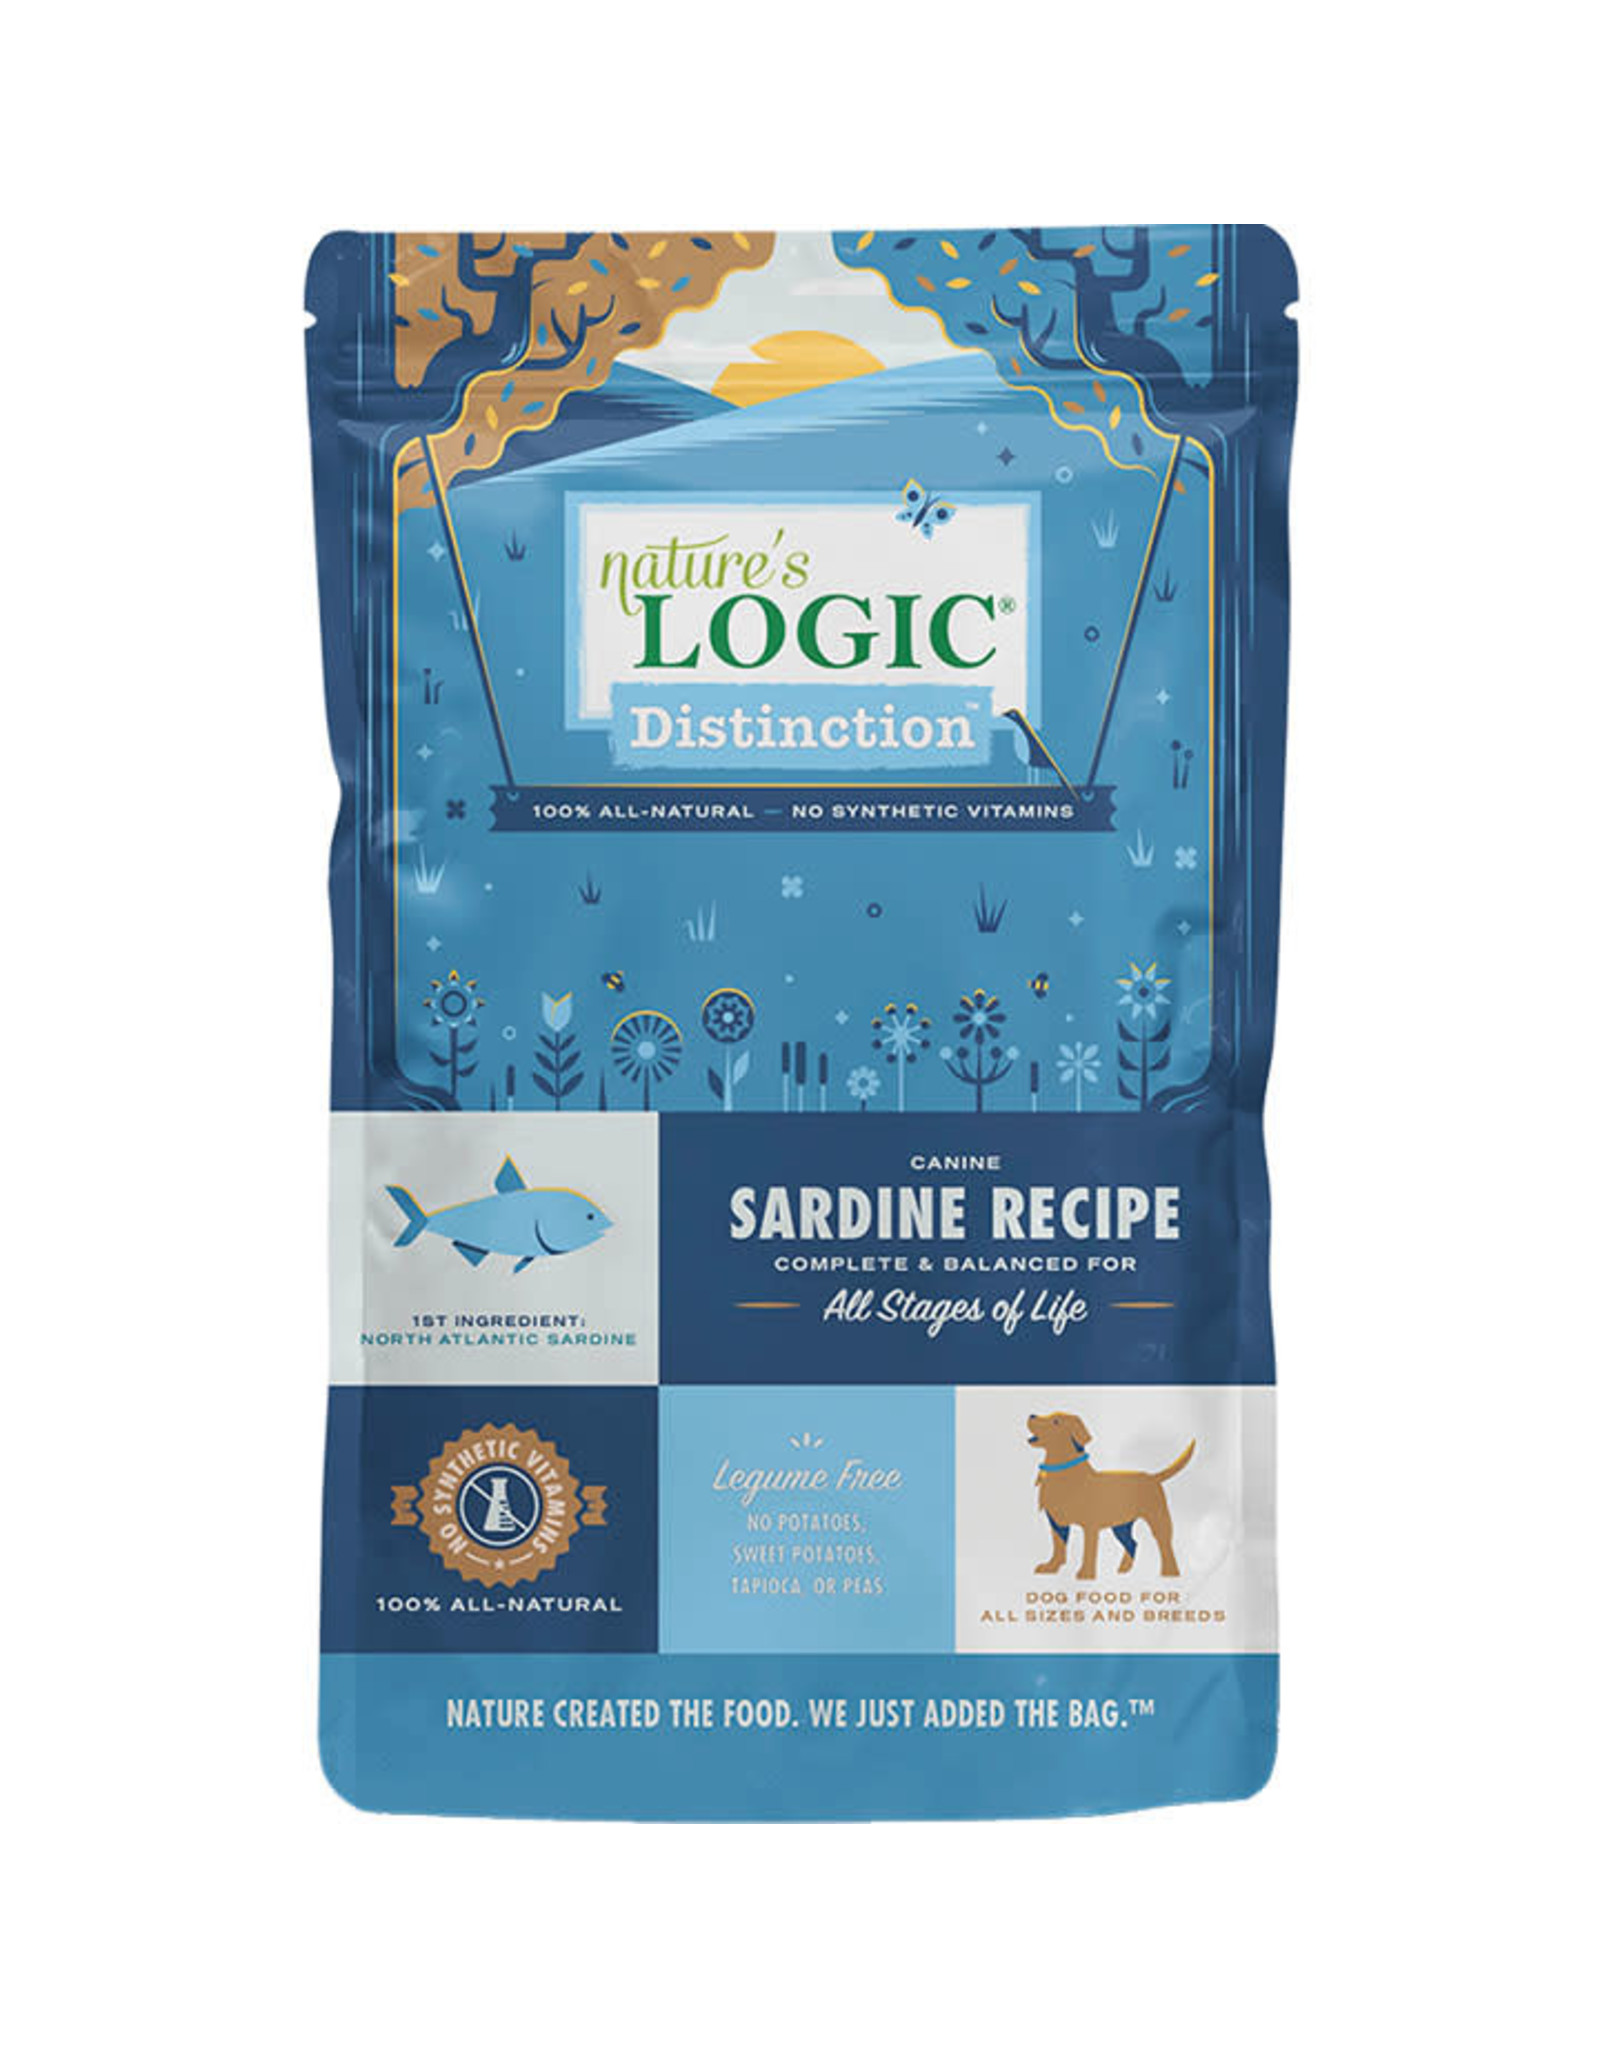 Nature's Logic Nature's Logic Distinction Sardine Recipe Dog Food